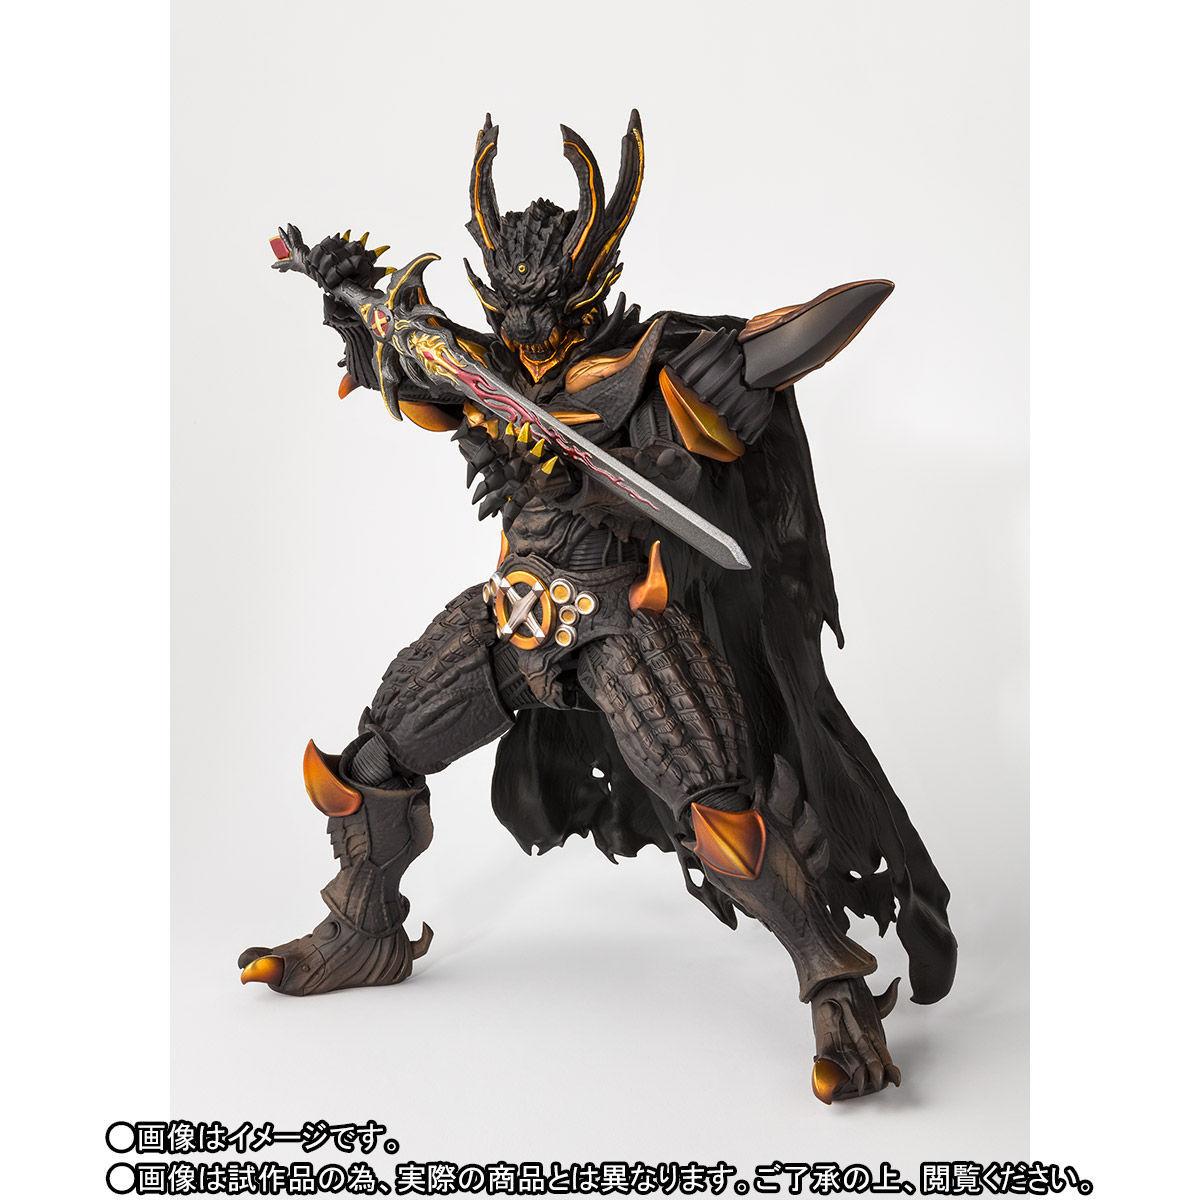 Figuarts(真骨彫製法) 暗黒騎士キバ予約5